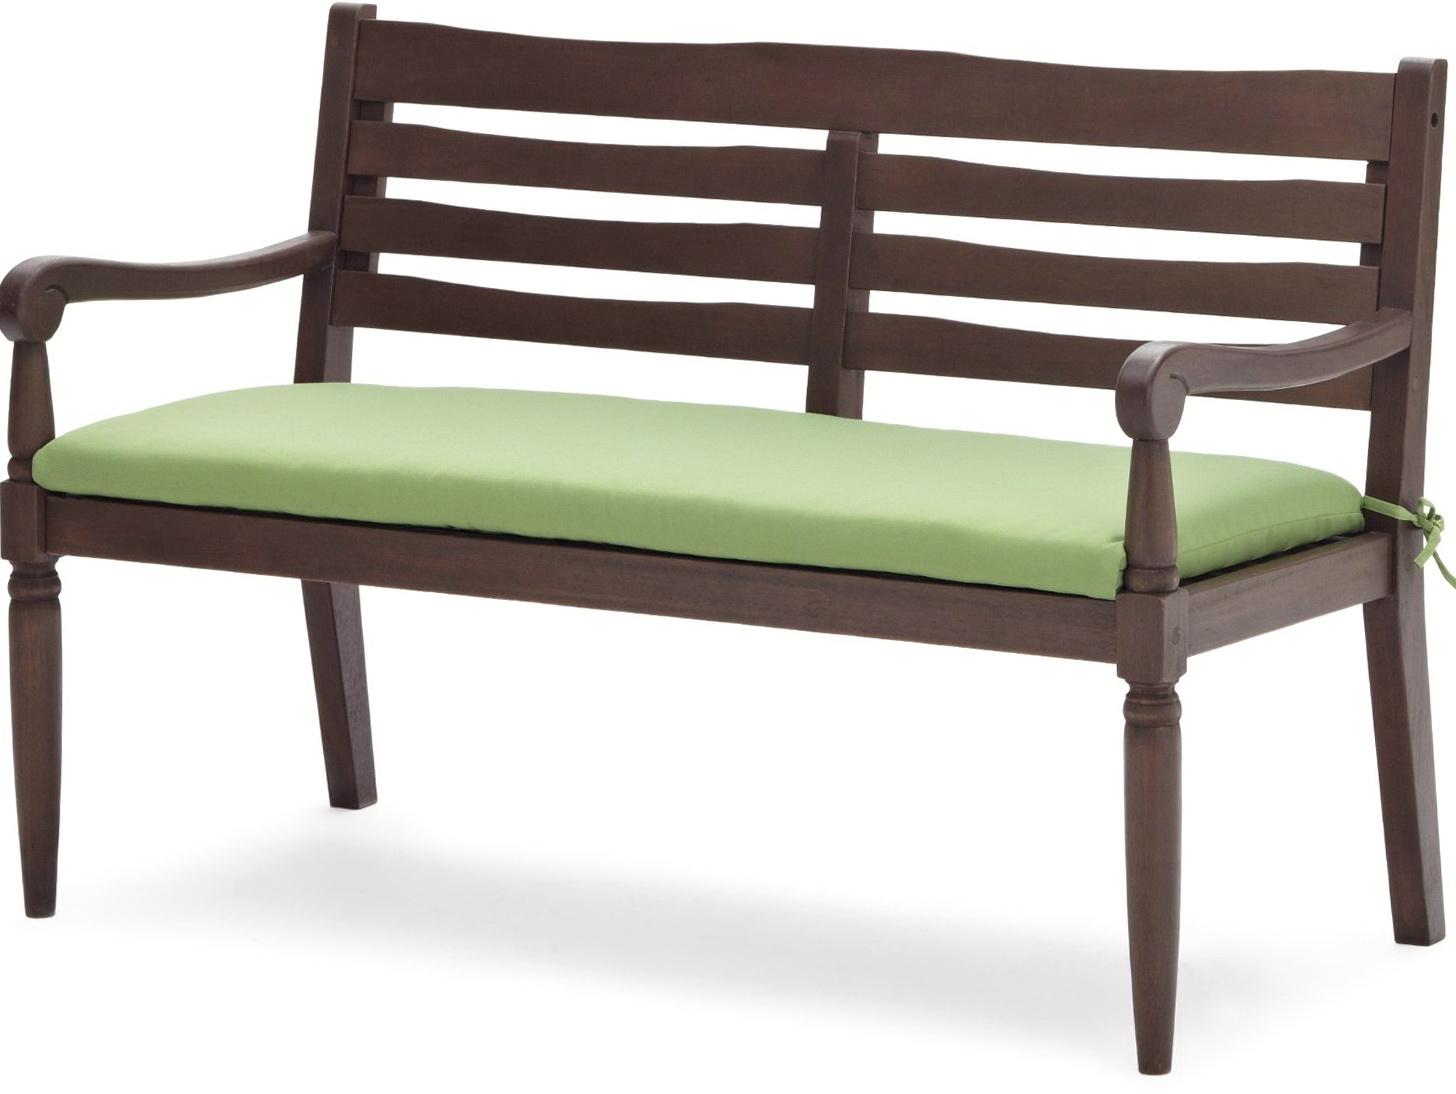 Outdoor Bench Cushion Amazon